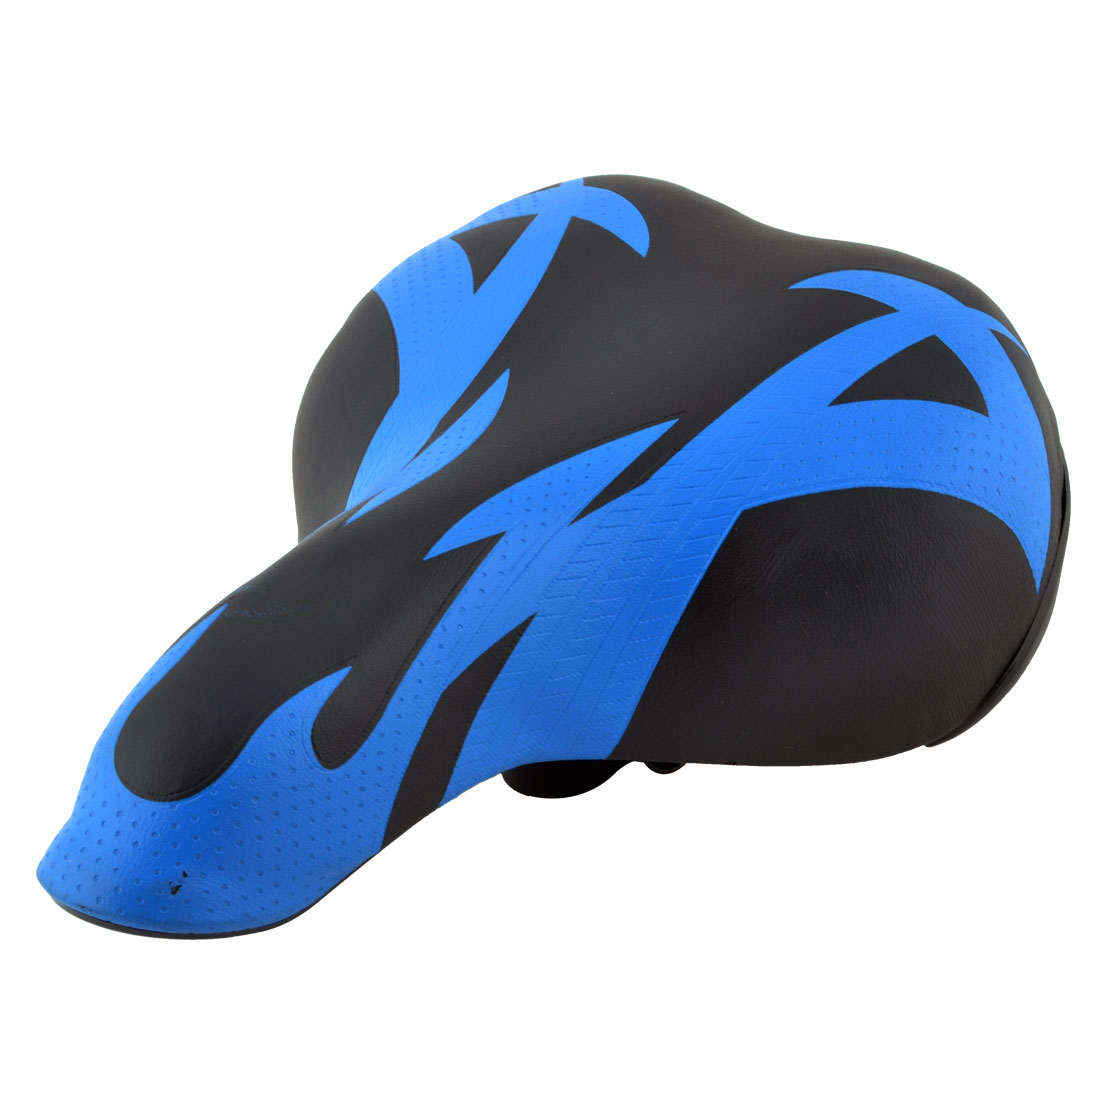 Mountain Bicycle Biking Accessories Faux Leather Blue Black Seat Saddle Cushion